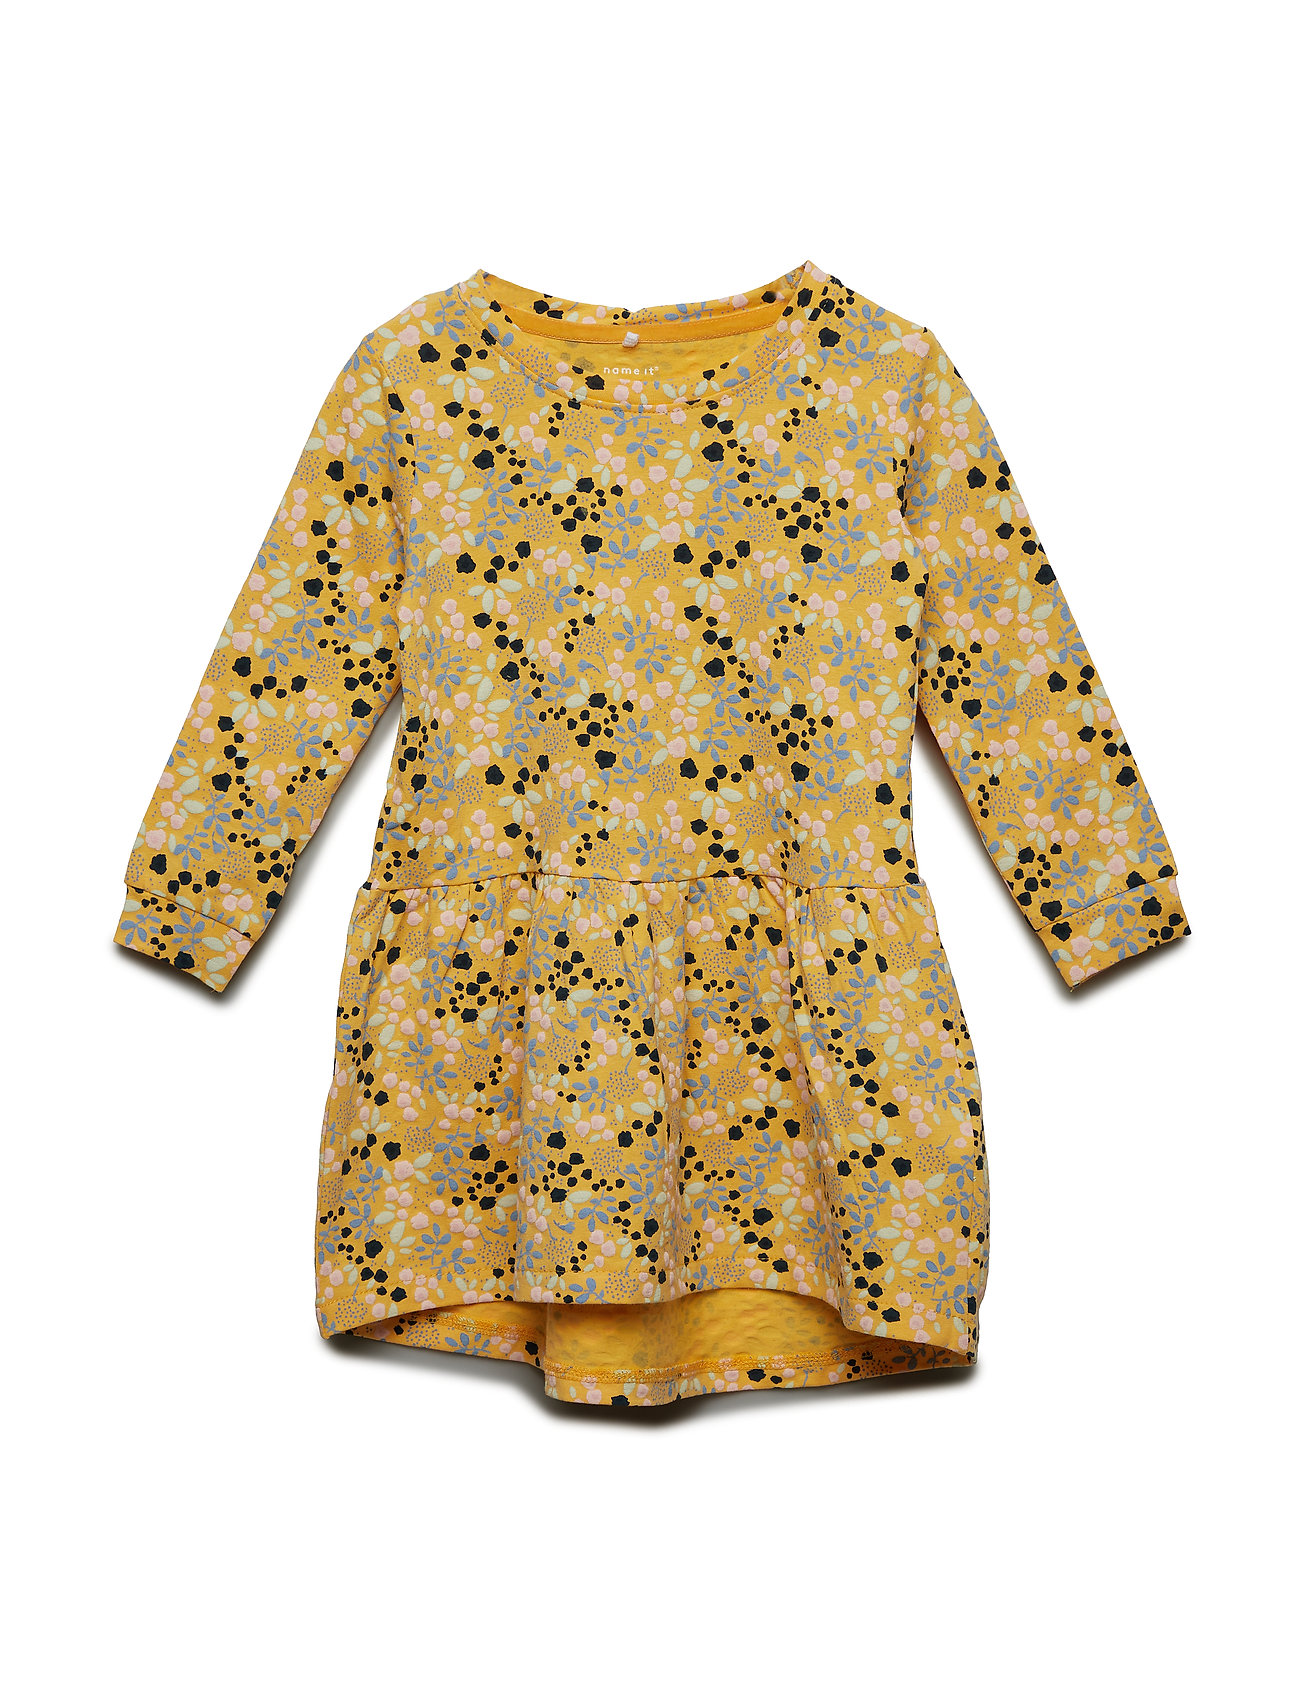 Image of Nmffijane Ls Dress Kjole Gul NAME IT (3142892289)